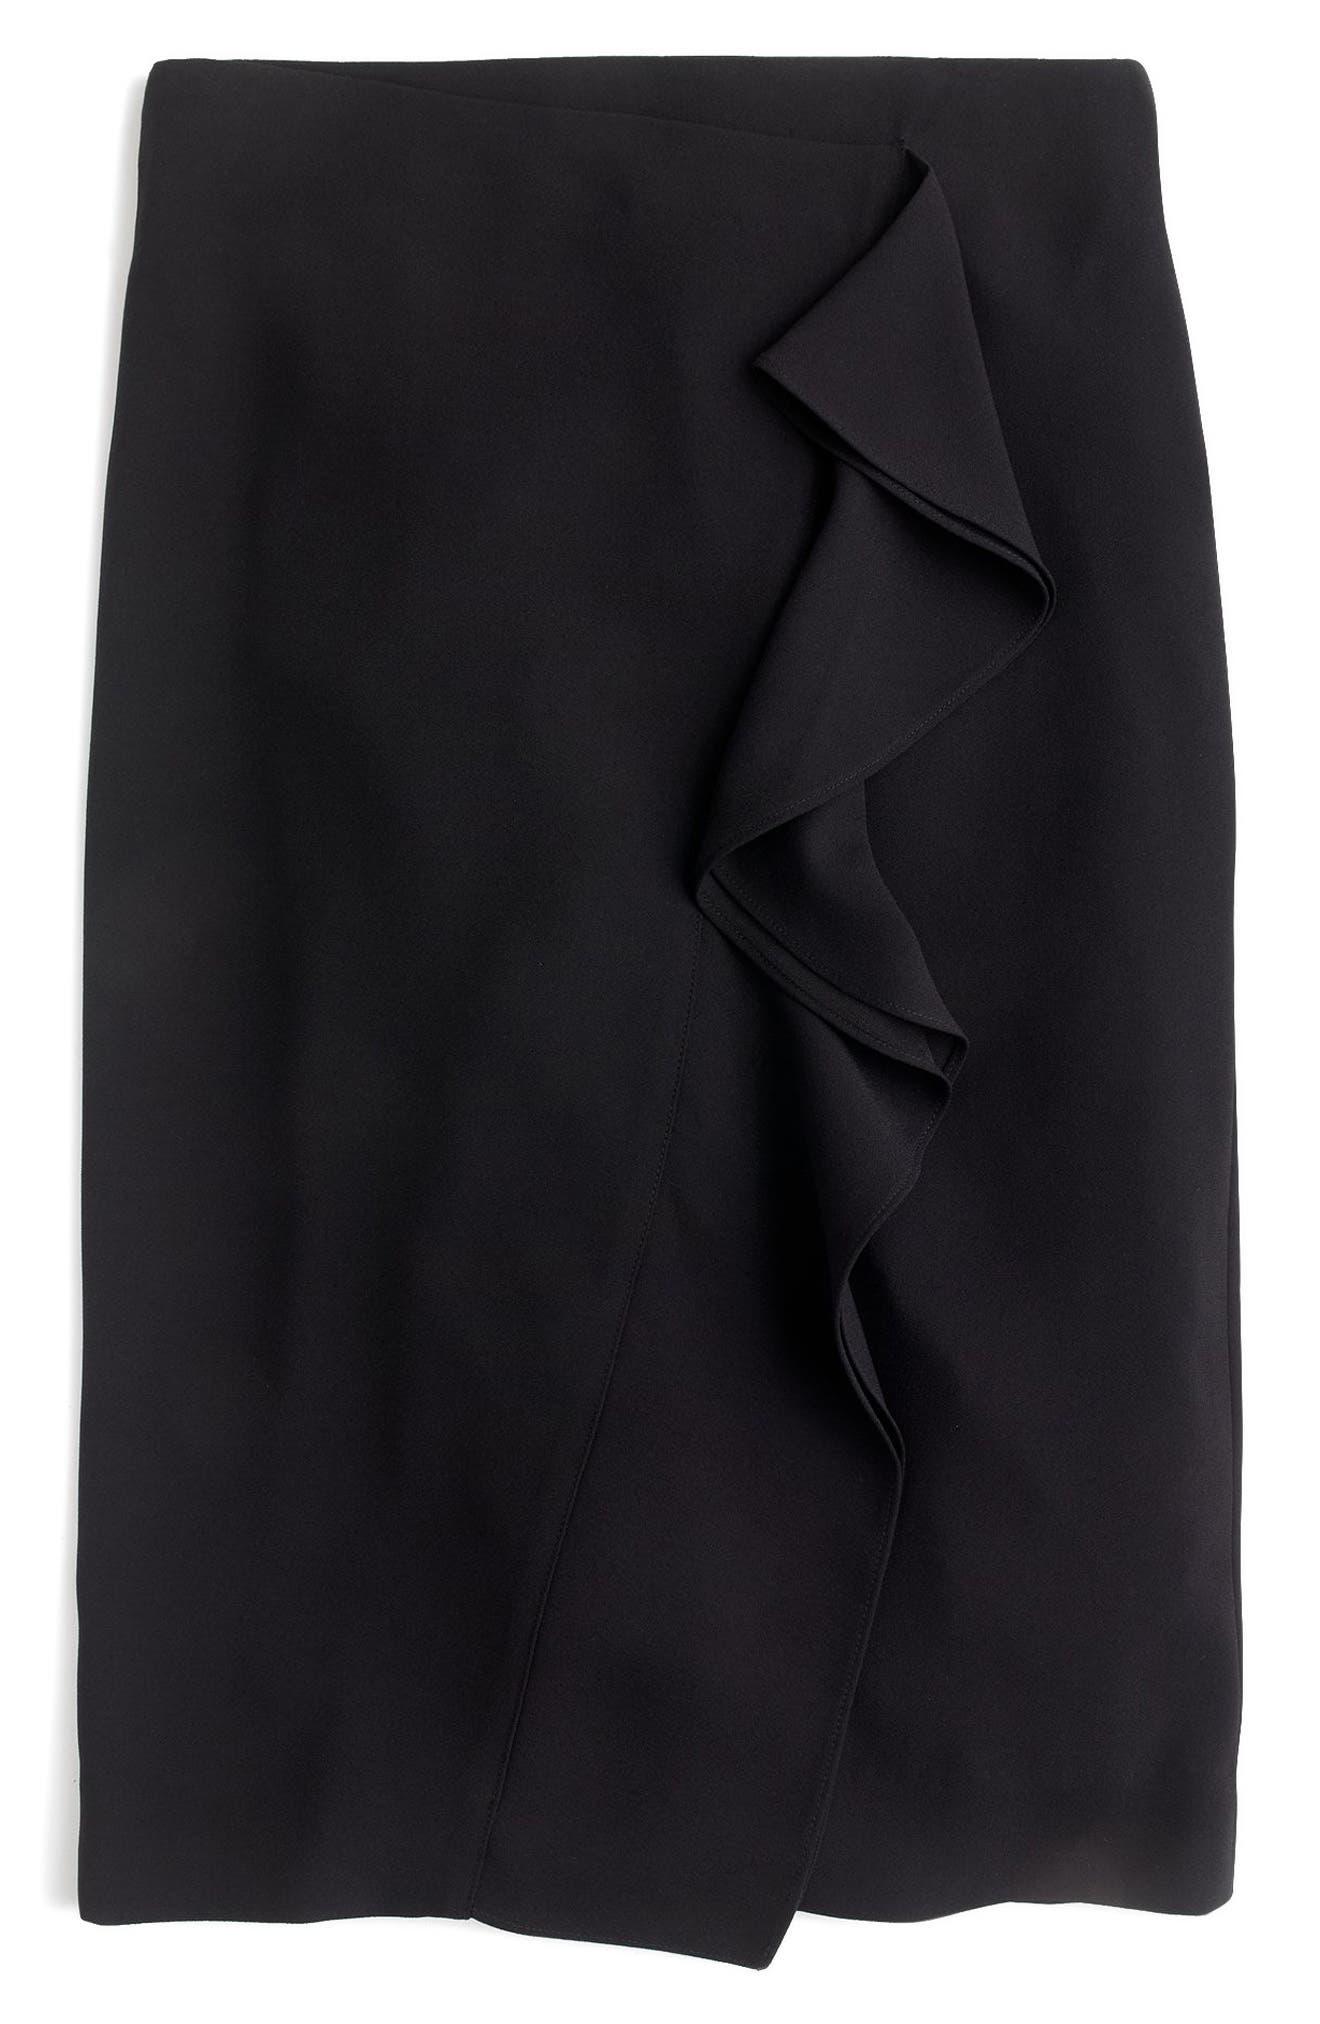 365 Crepe Ruffle Pencil Skirt,                             Main thumbnail 1, color,                             001